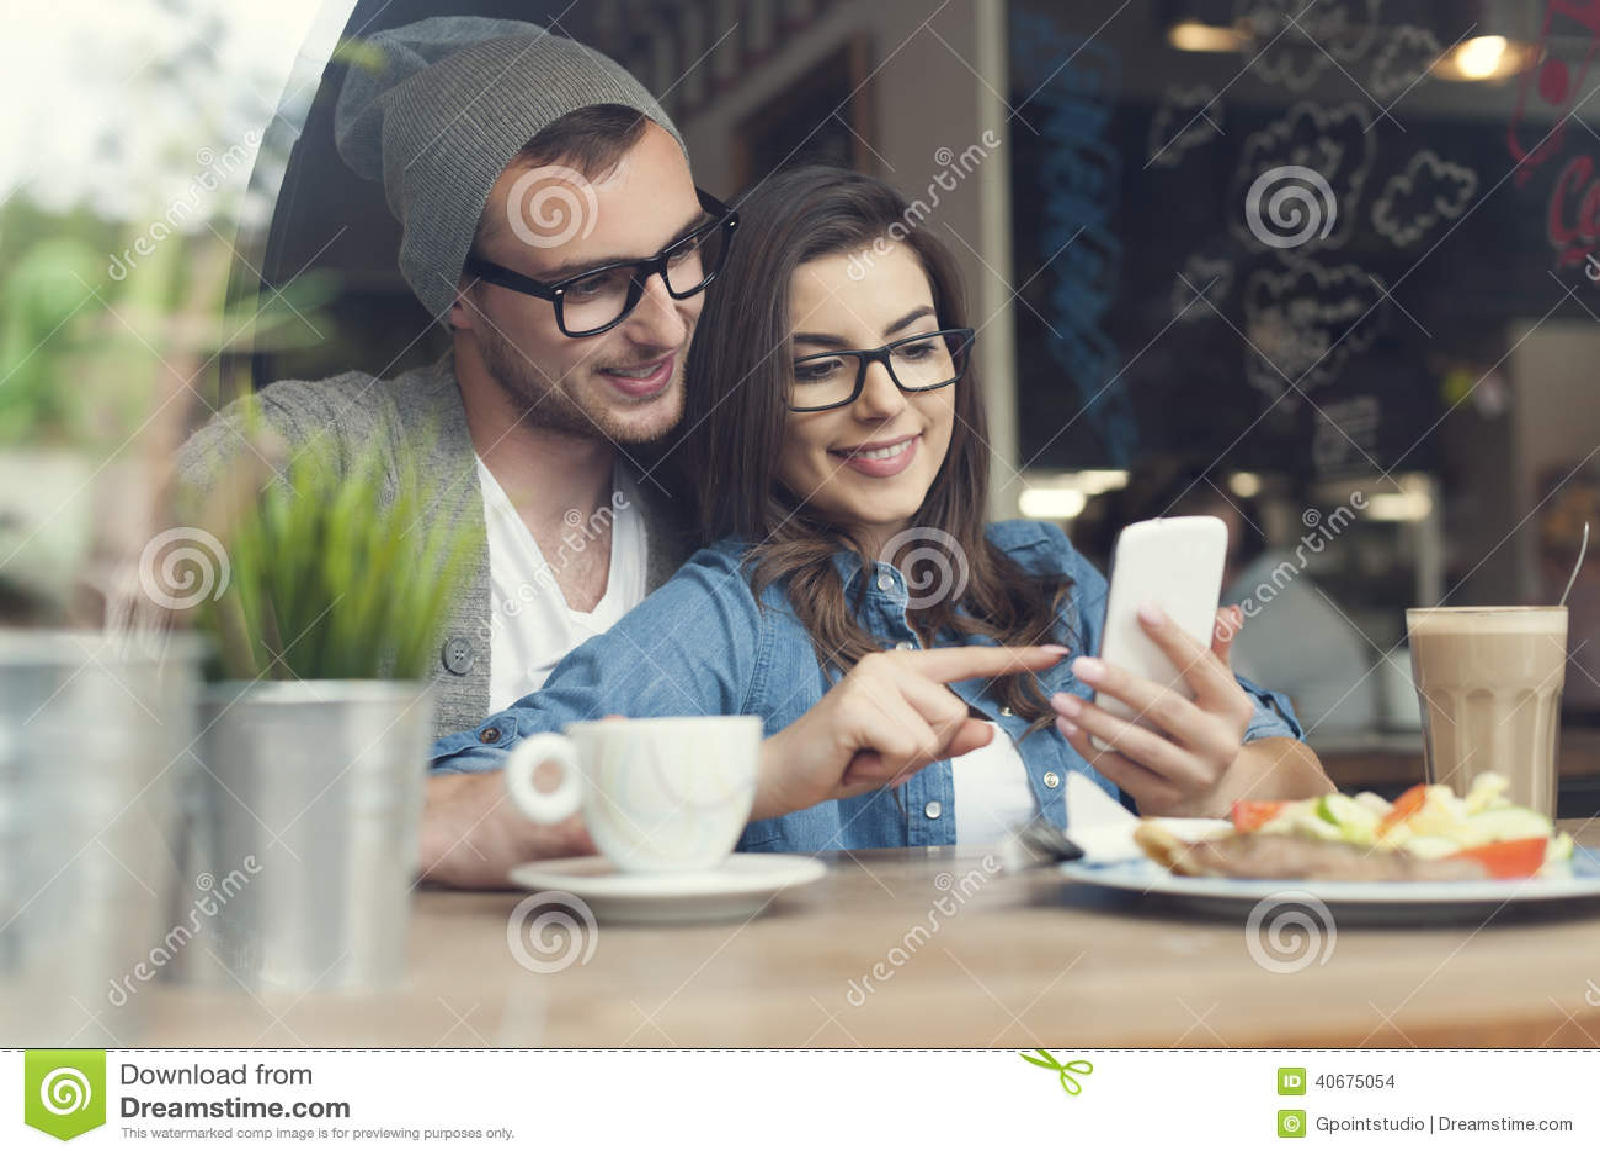 Dating cafe braunschweig